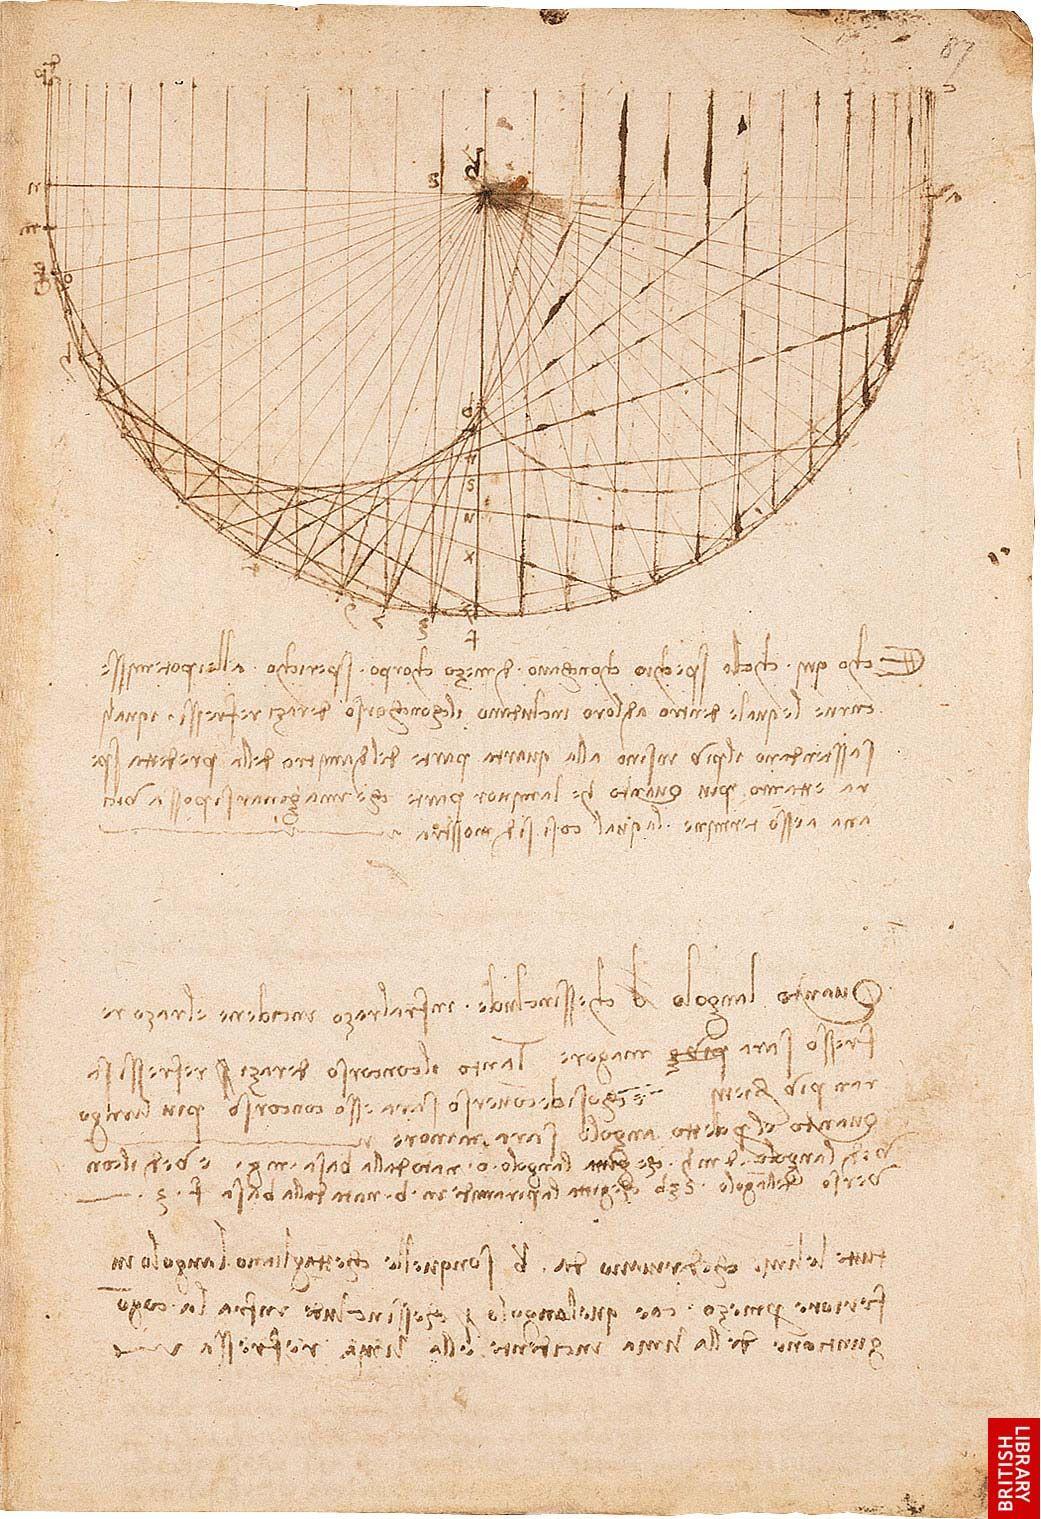 Da Vinci And His Reflective Handwriting